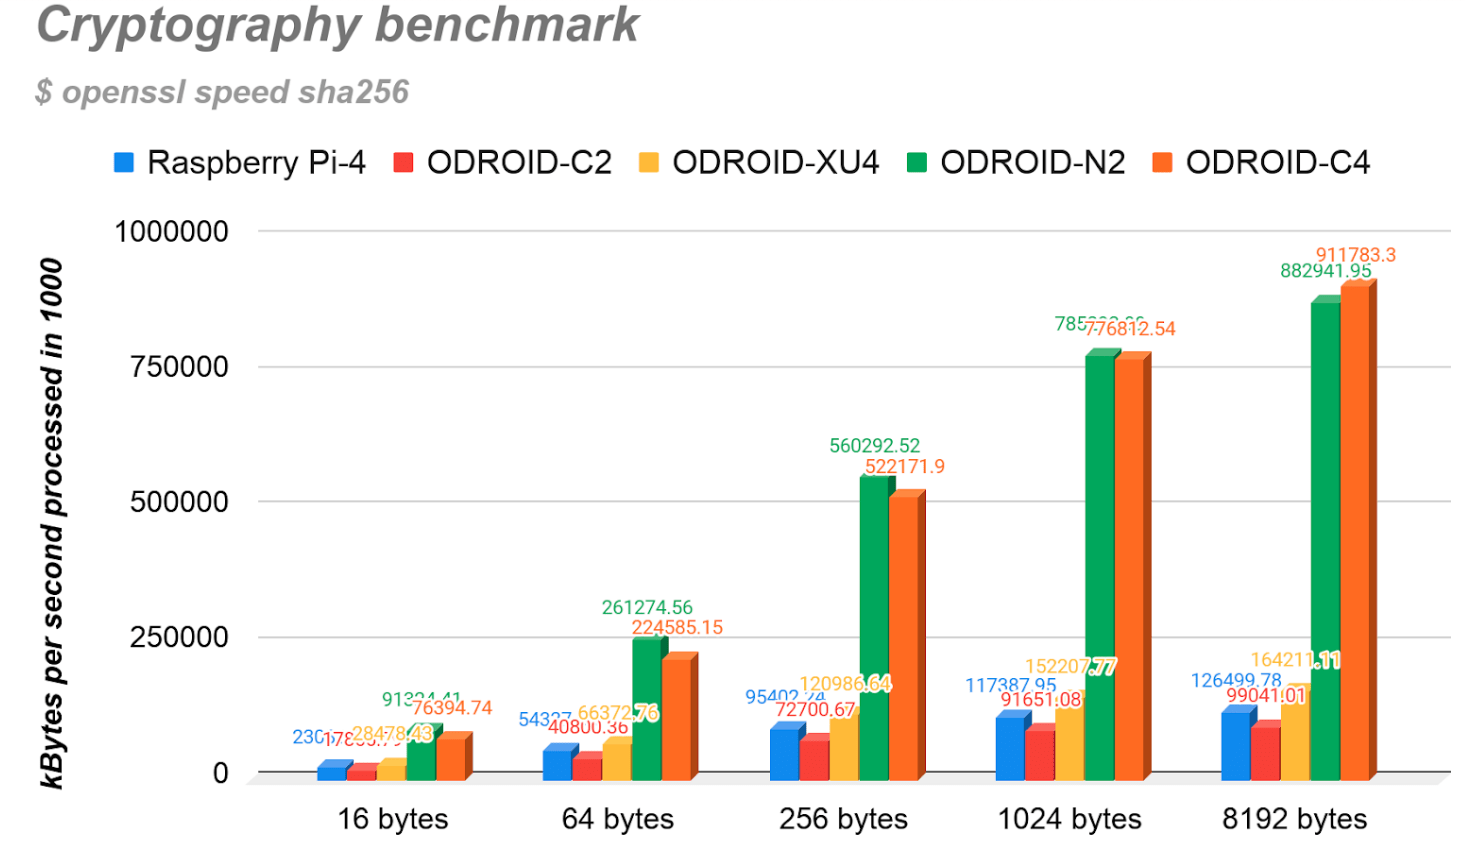 ODROID-C4 Crypto Benchmark